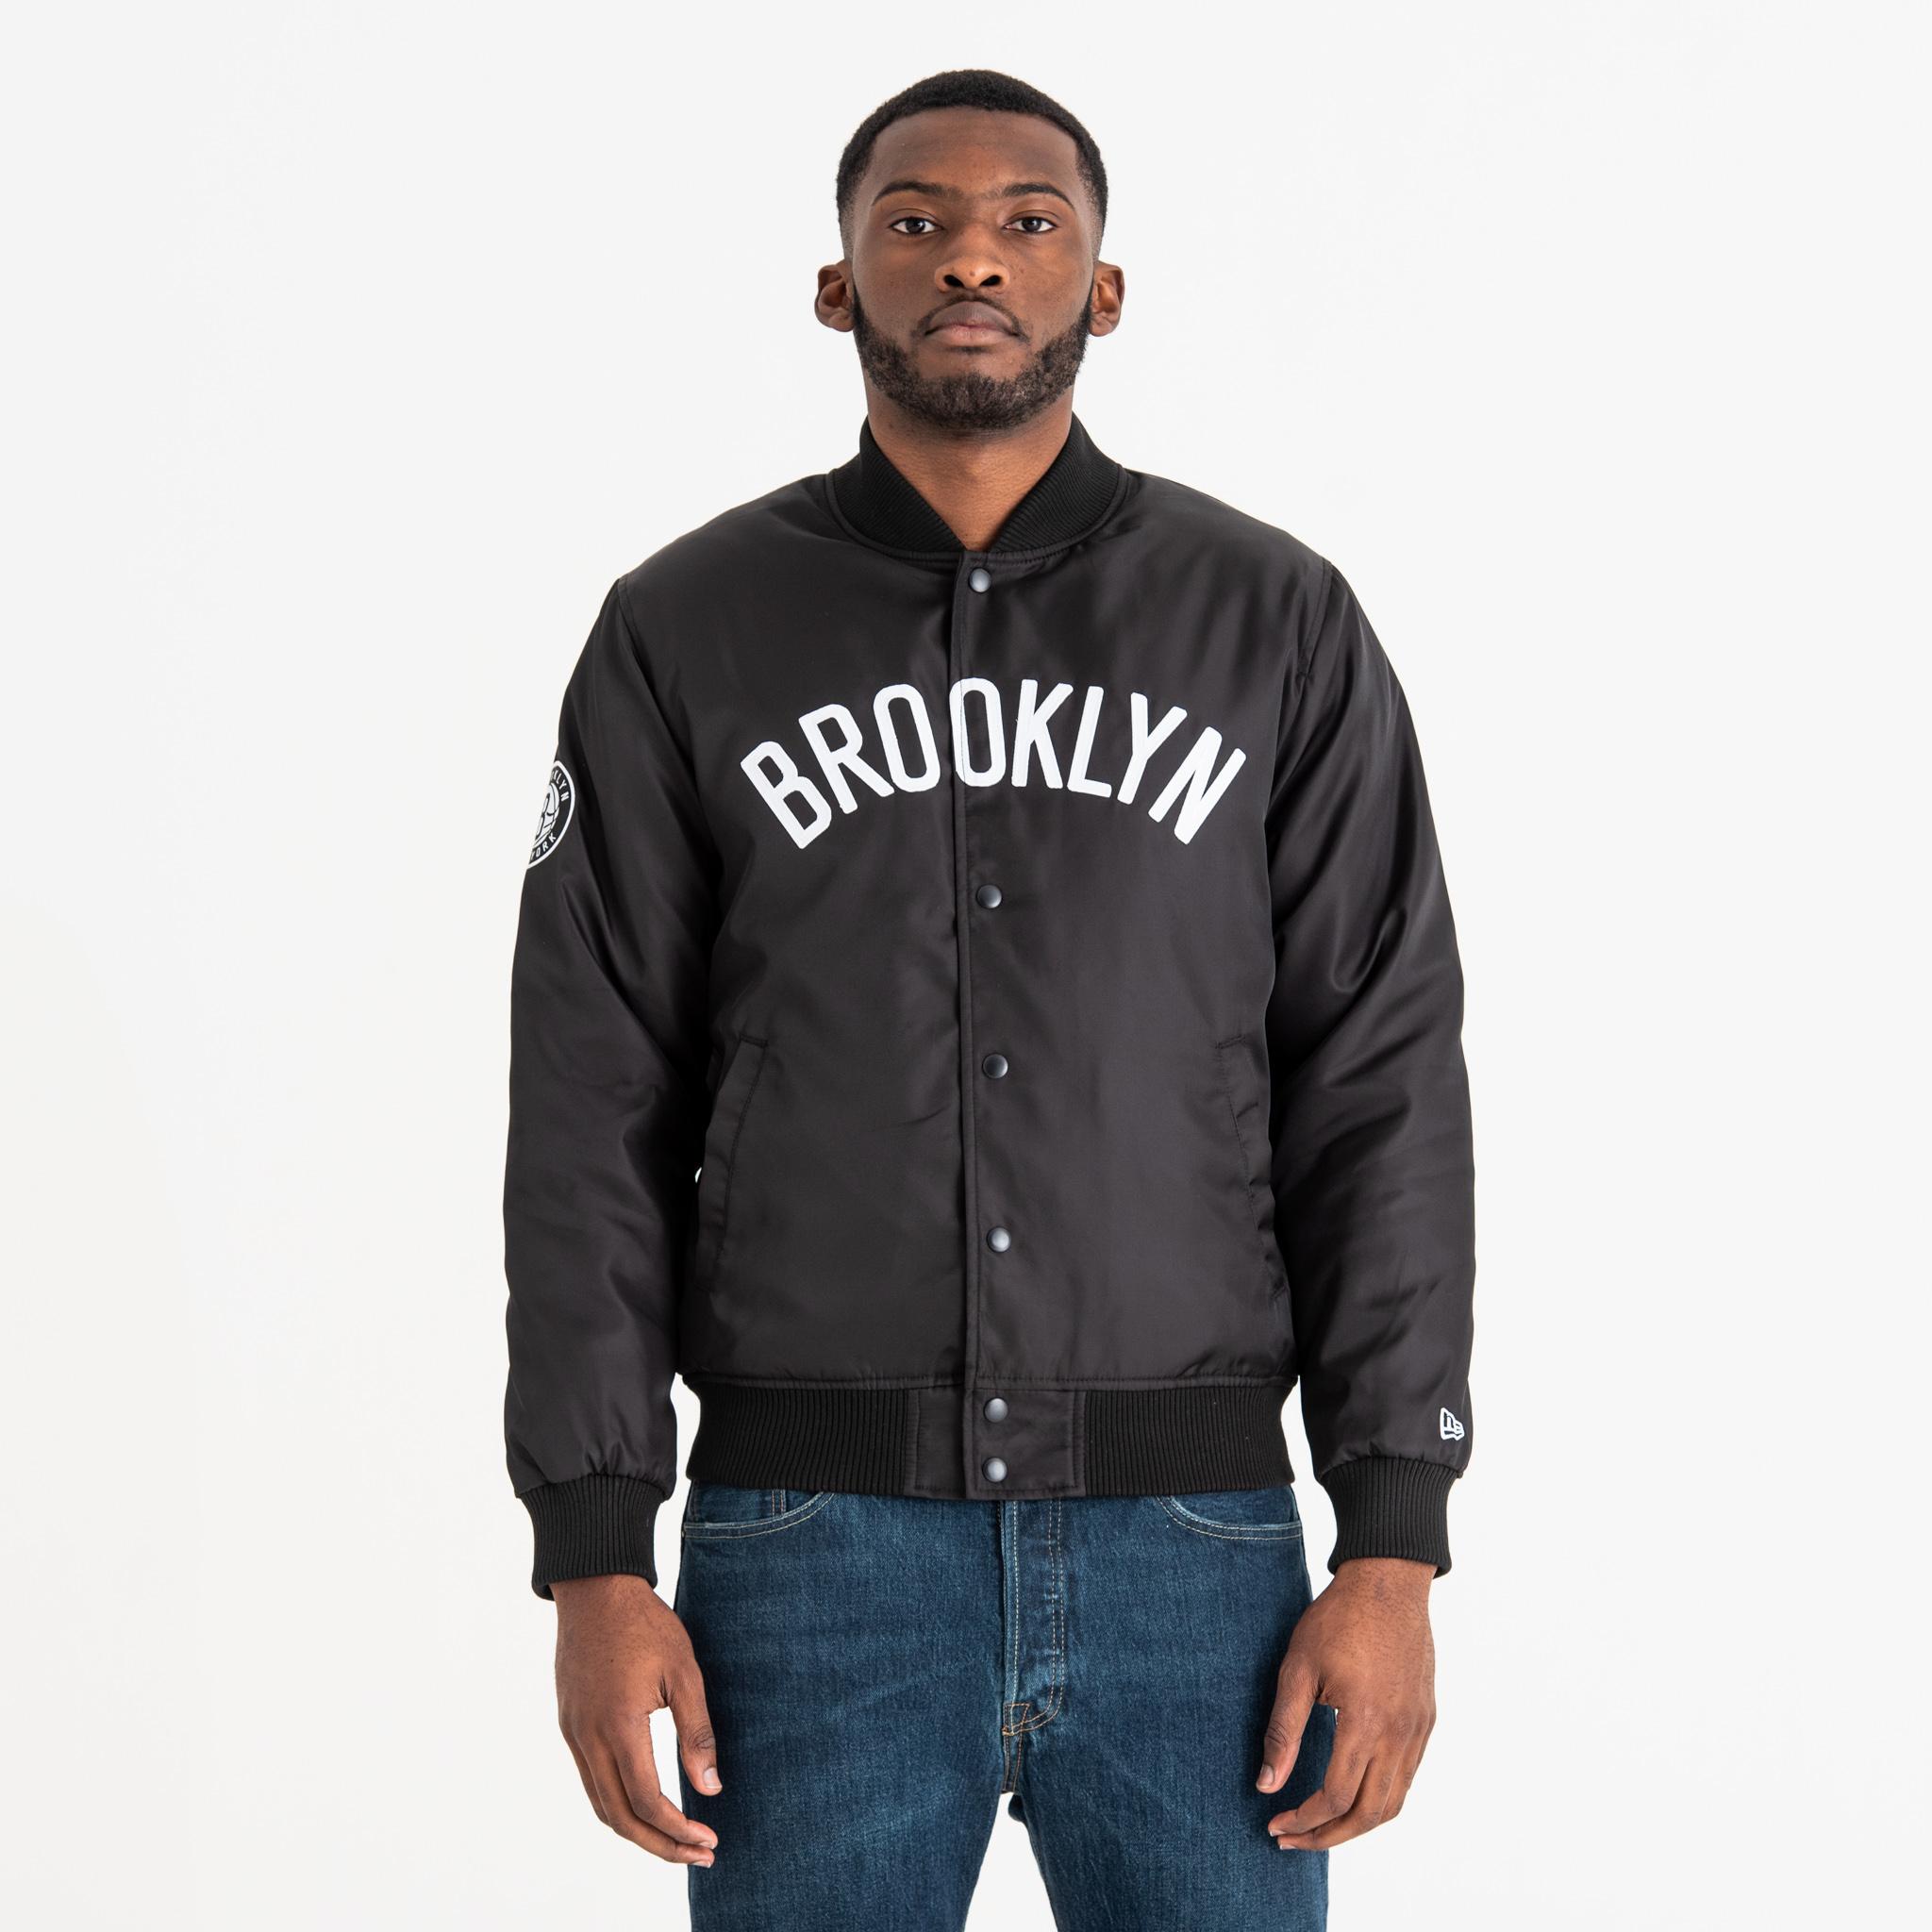 Jacke Brooklyn Blouson He